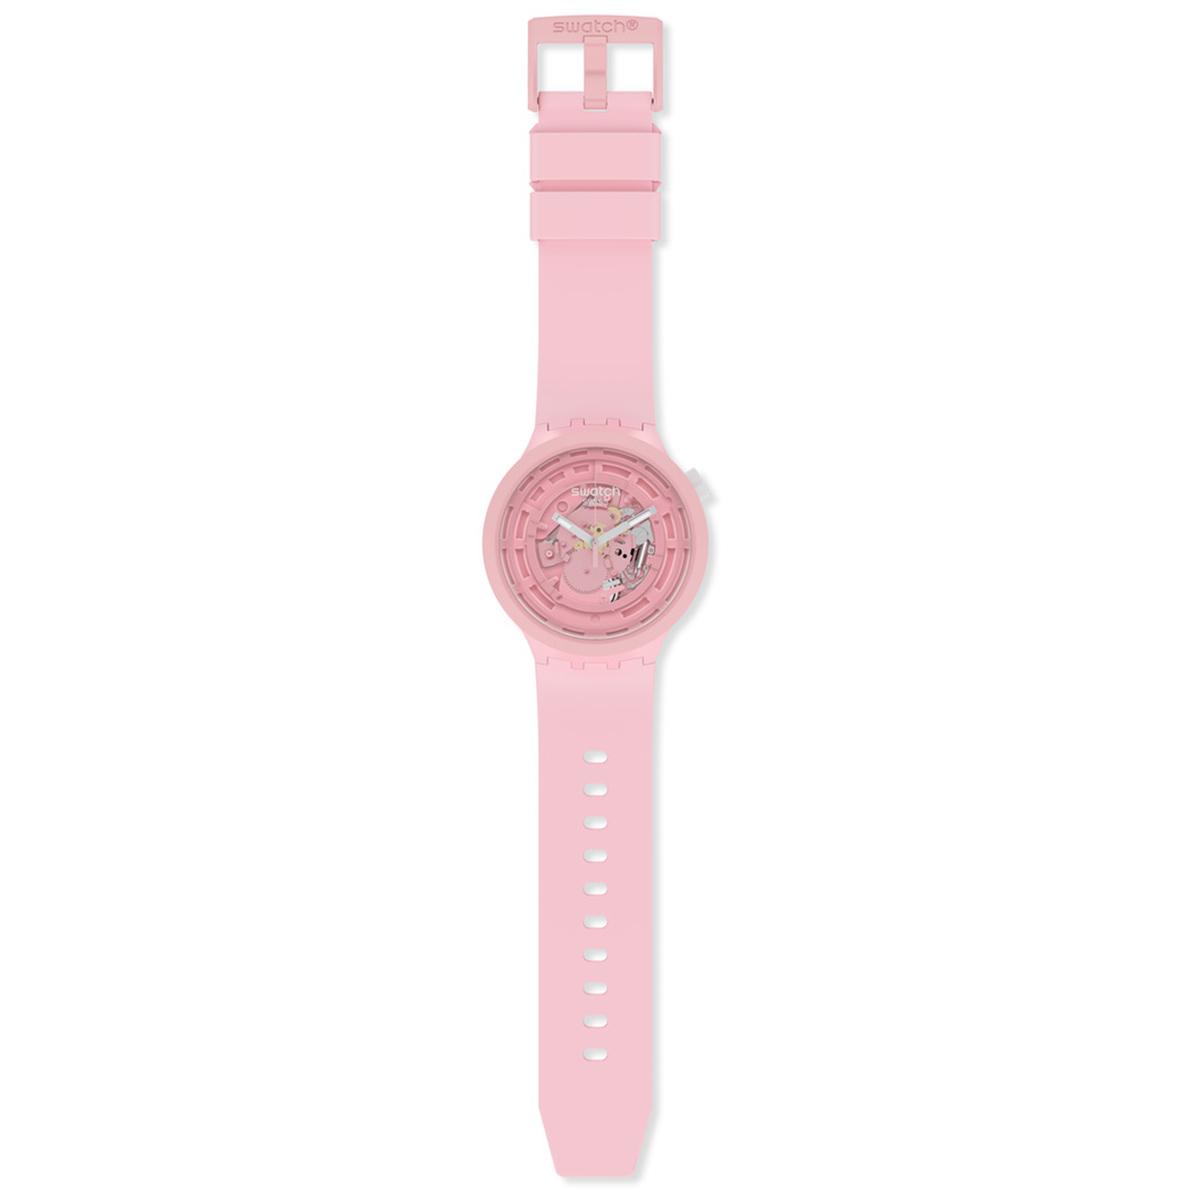 swatch スウォッチ 腕時計 メンズ レディース オリジナルズ ビッグボールド バイオセラミック C-PINK BIG BOLD BIOCERAMIC SB03P100